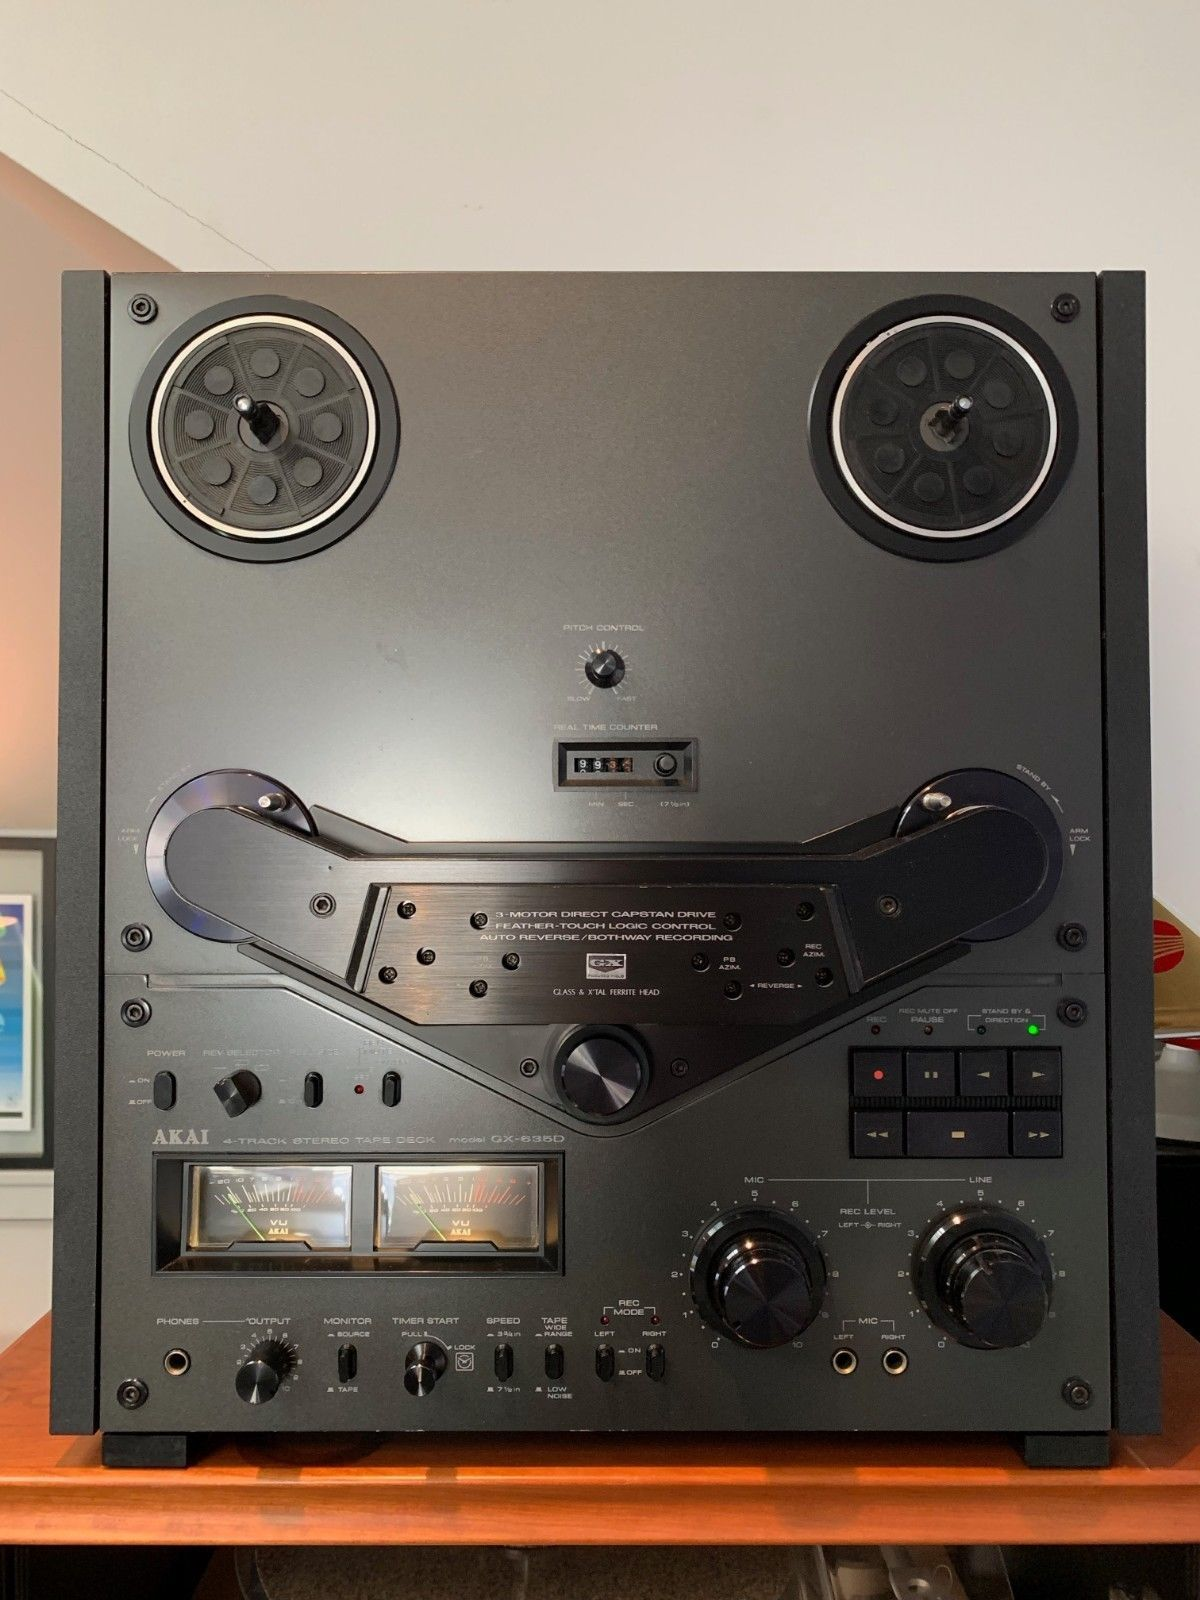 Akai GX-635D reel to reel VGC Serviced by Reel Pro Sound | eBay